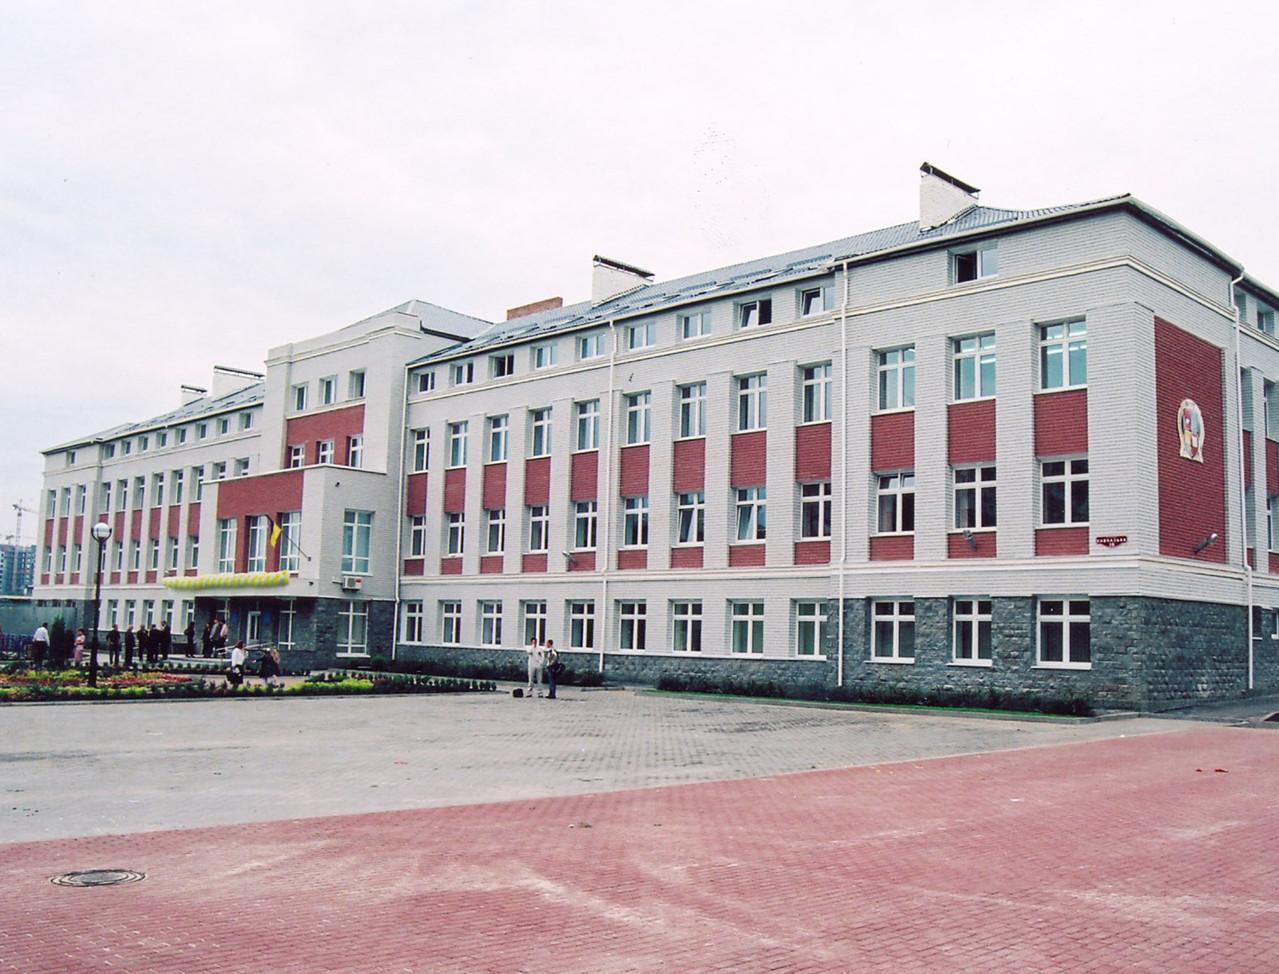 Середня школа по вул. Кавказька в м. Київ (нове будівництво)